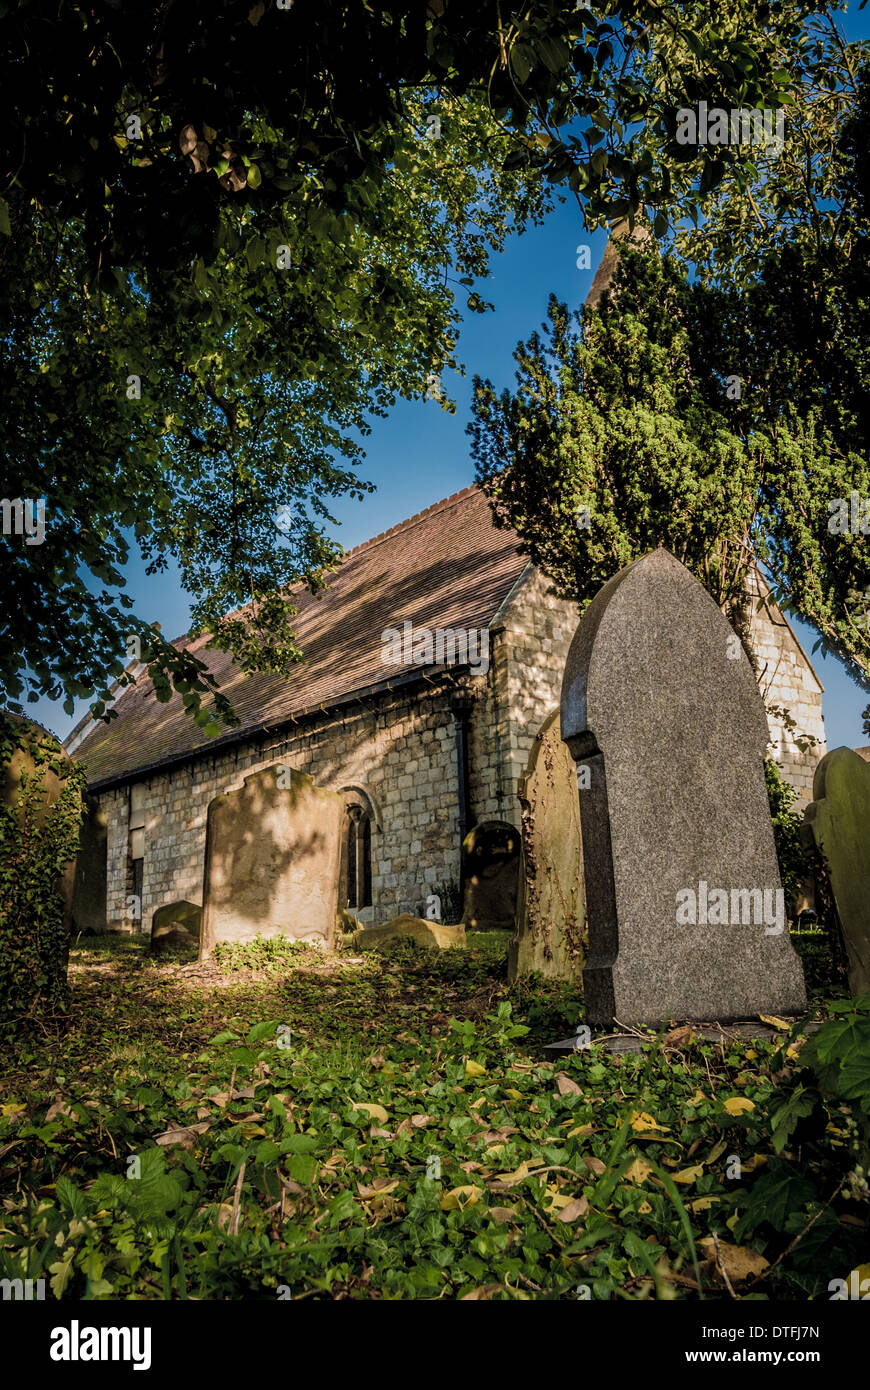 Gravestones in churchyard - Stock Image